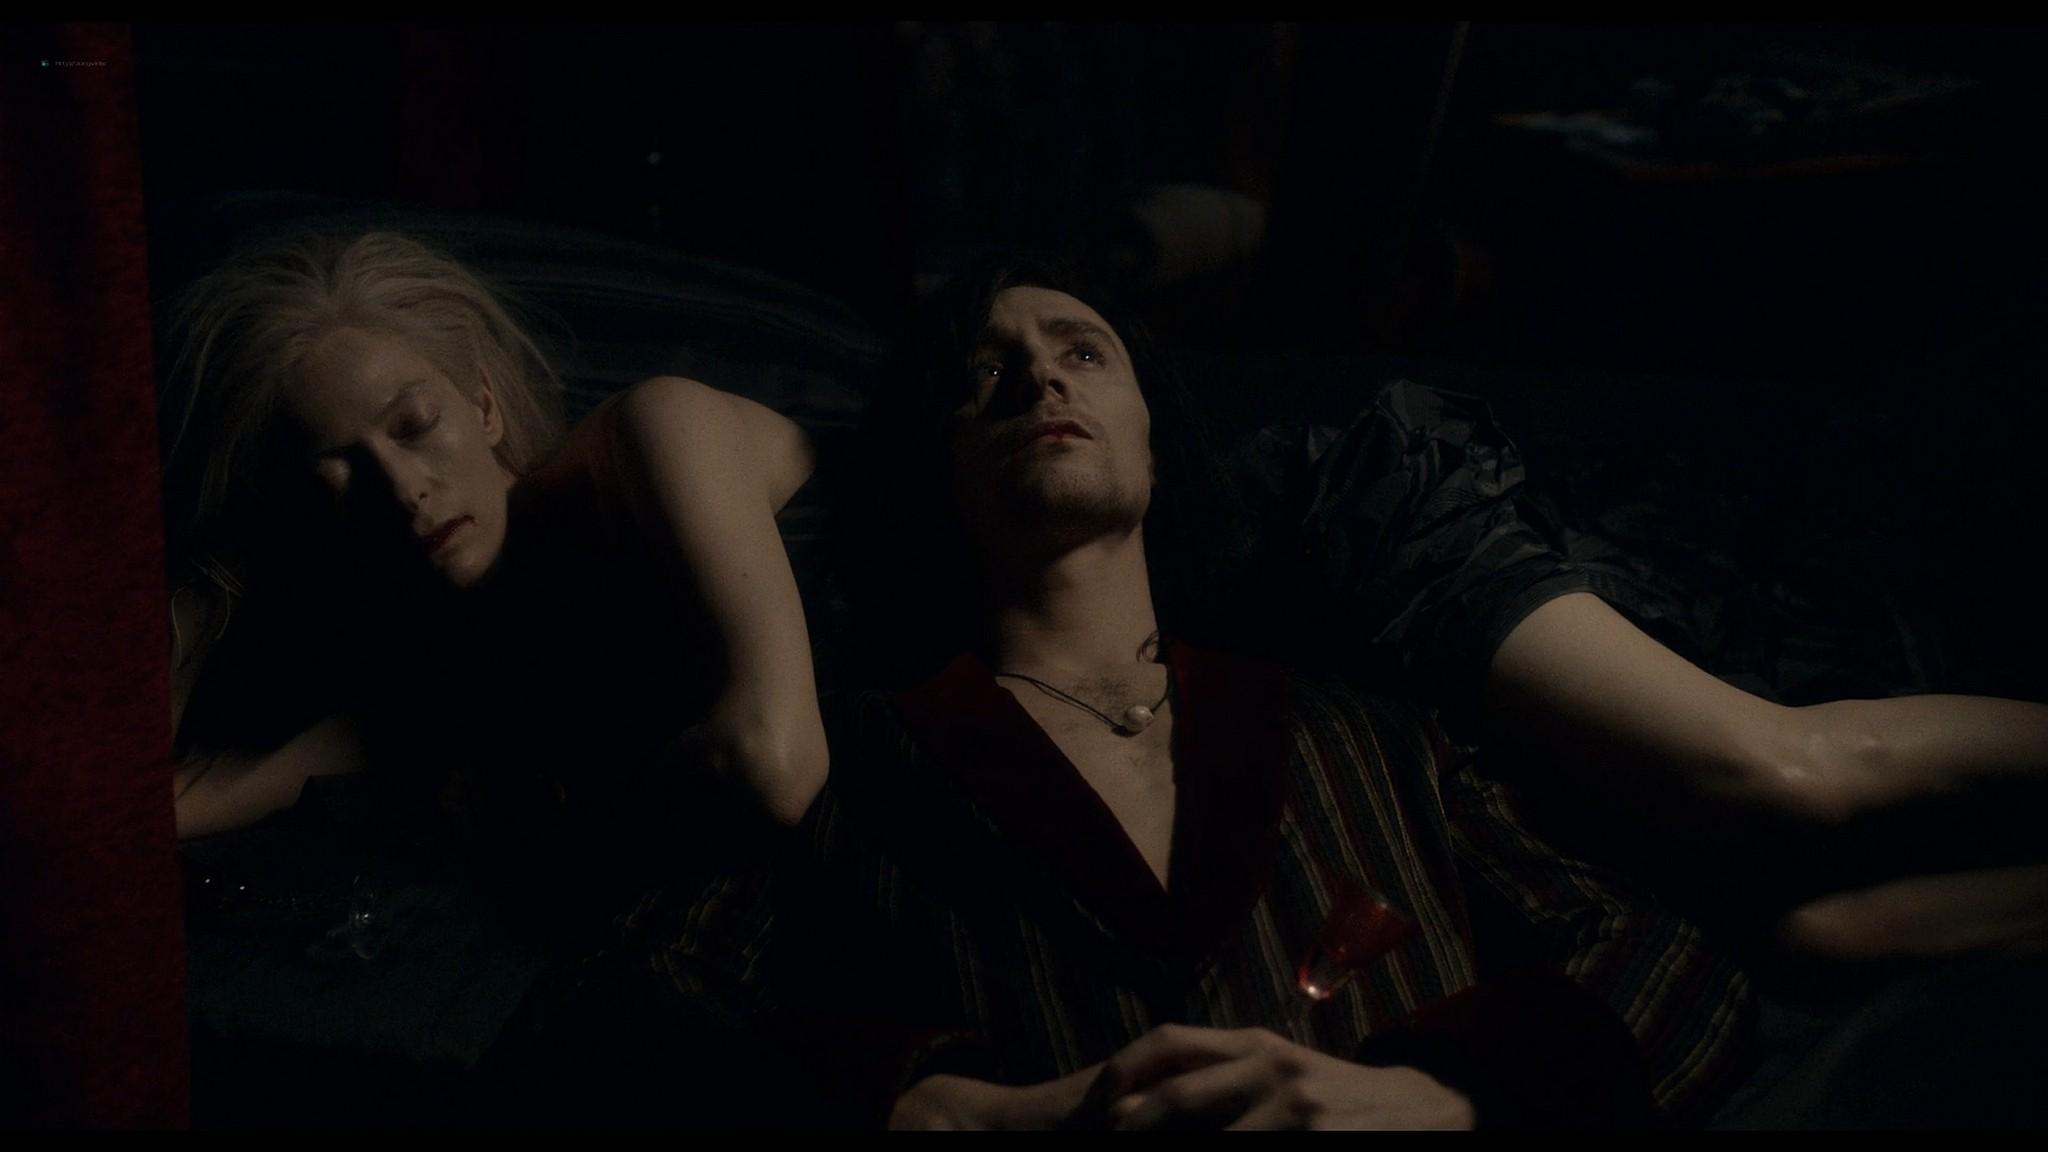 Tilda Swinton nude Mia Wasikowska sexy Only Lovers Left Alive 2013 HD 1080p BluRay 7